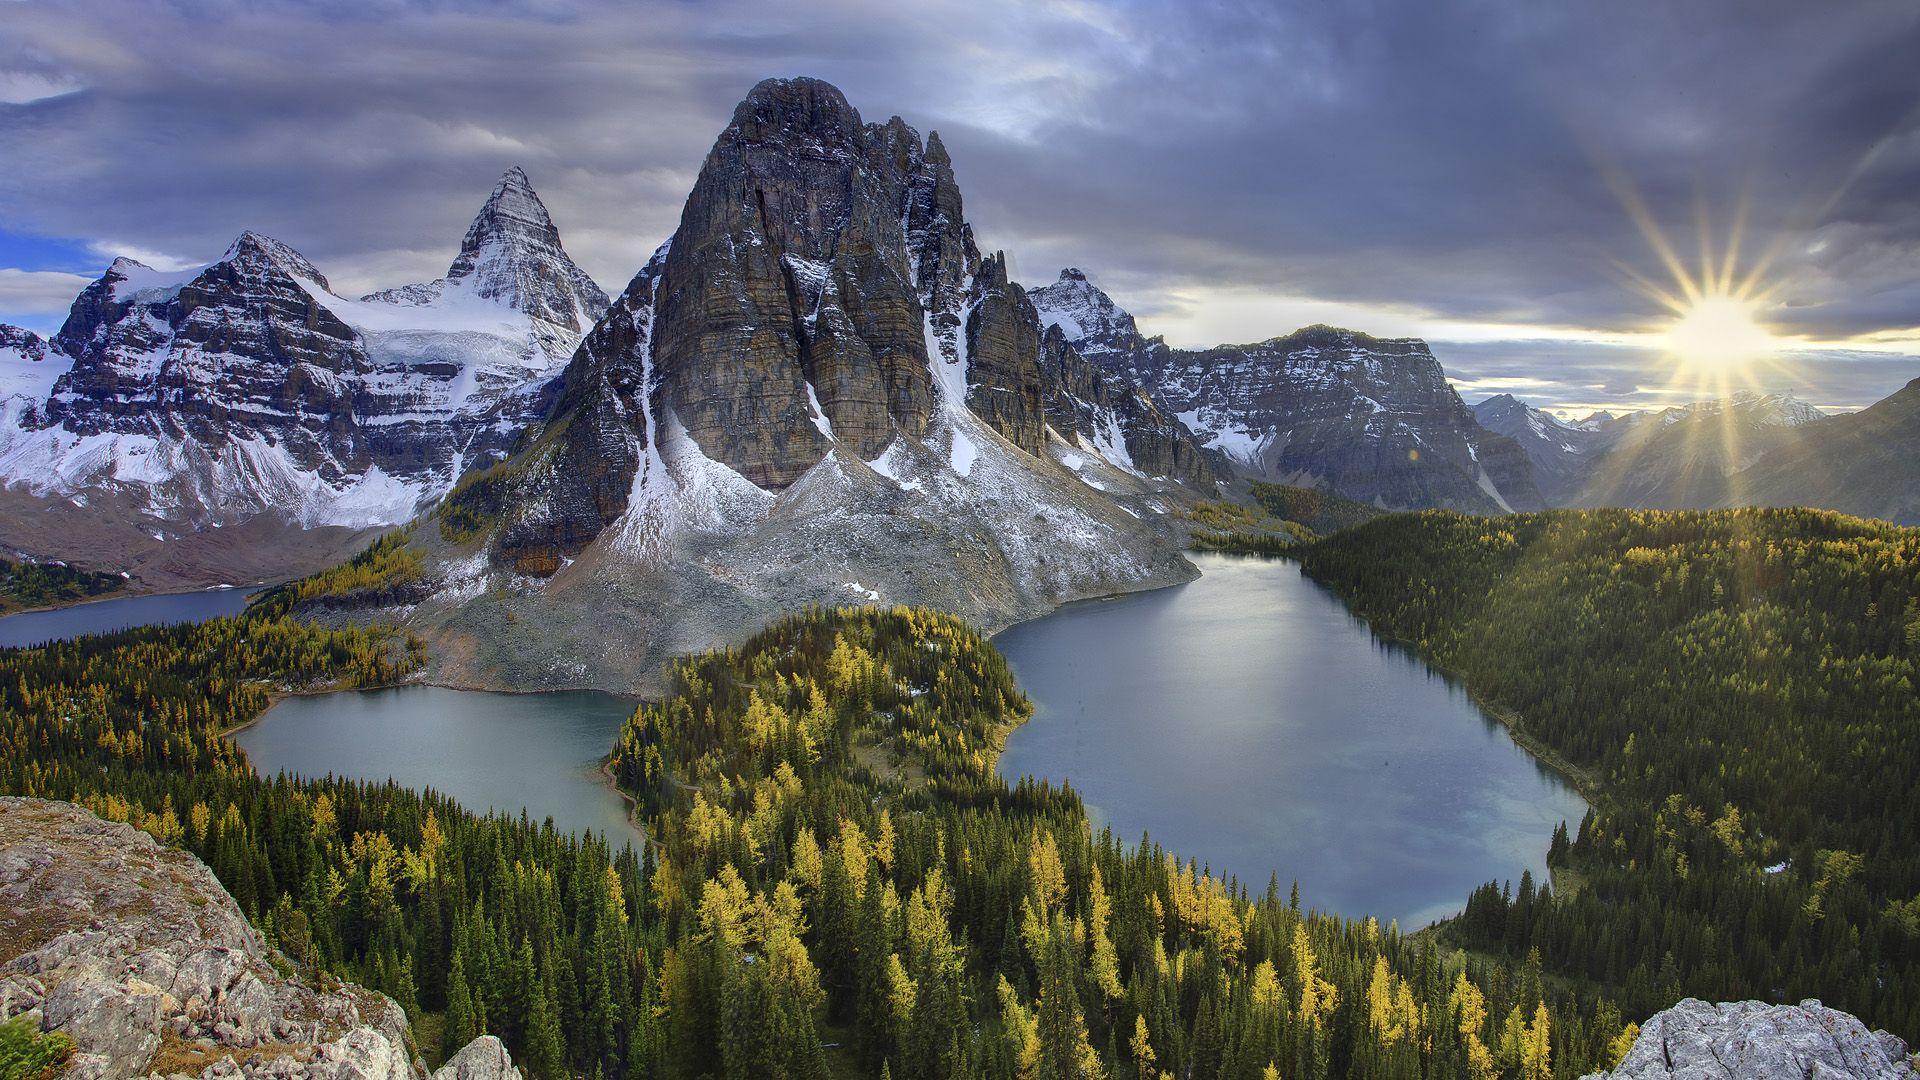 landscape mountain beautiful wallpaper - photo #28